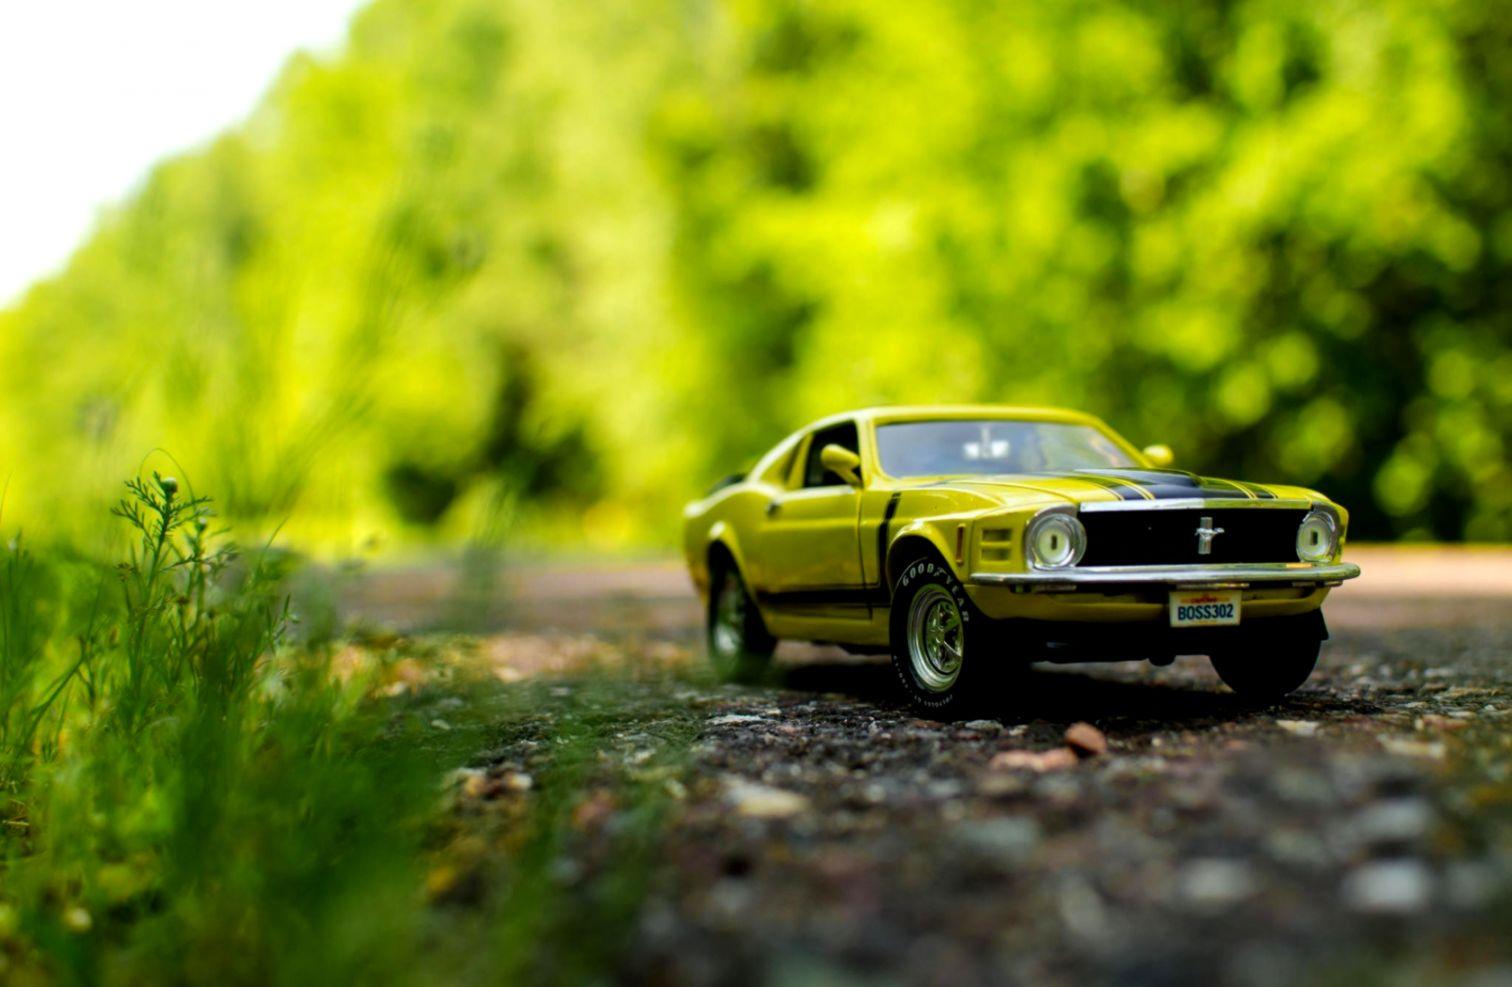 Car Toy Photo Hd Wallpaper Hd Wallpapers